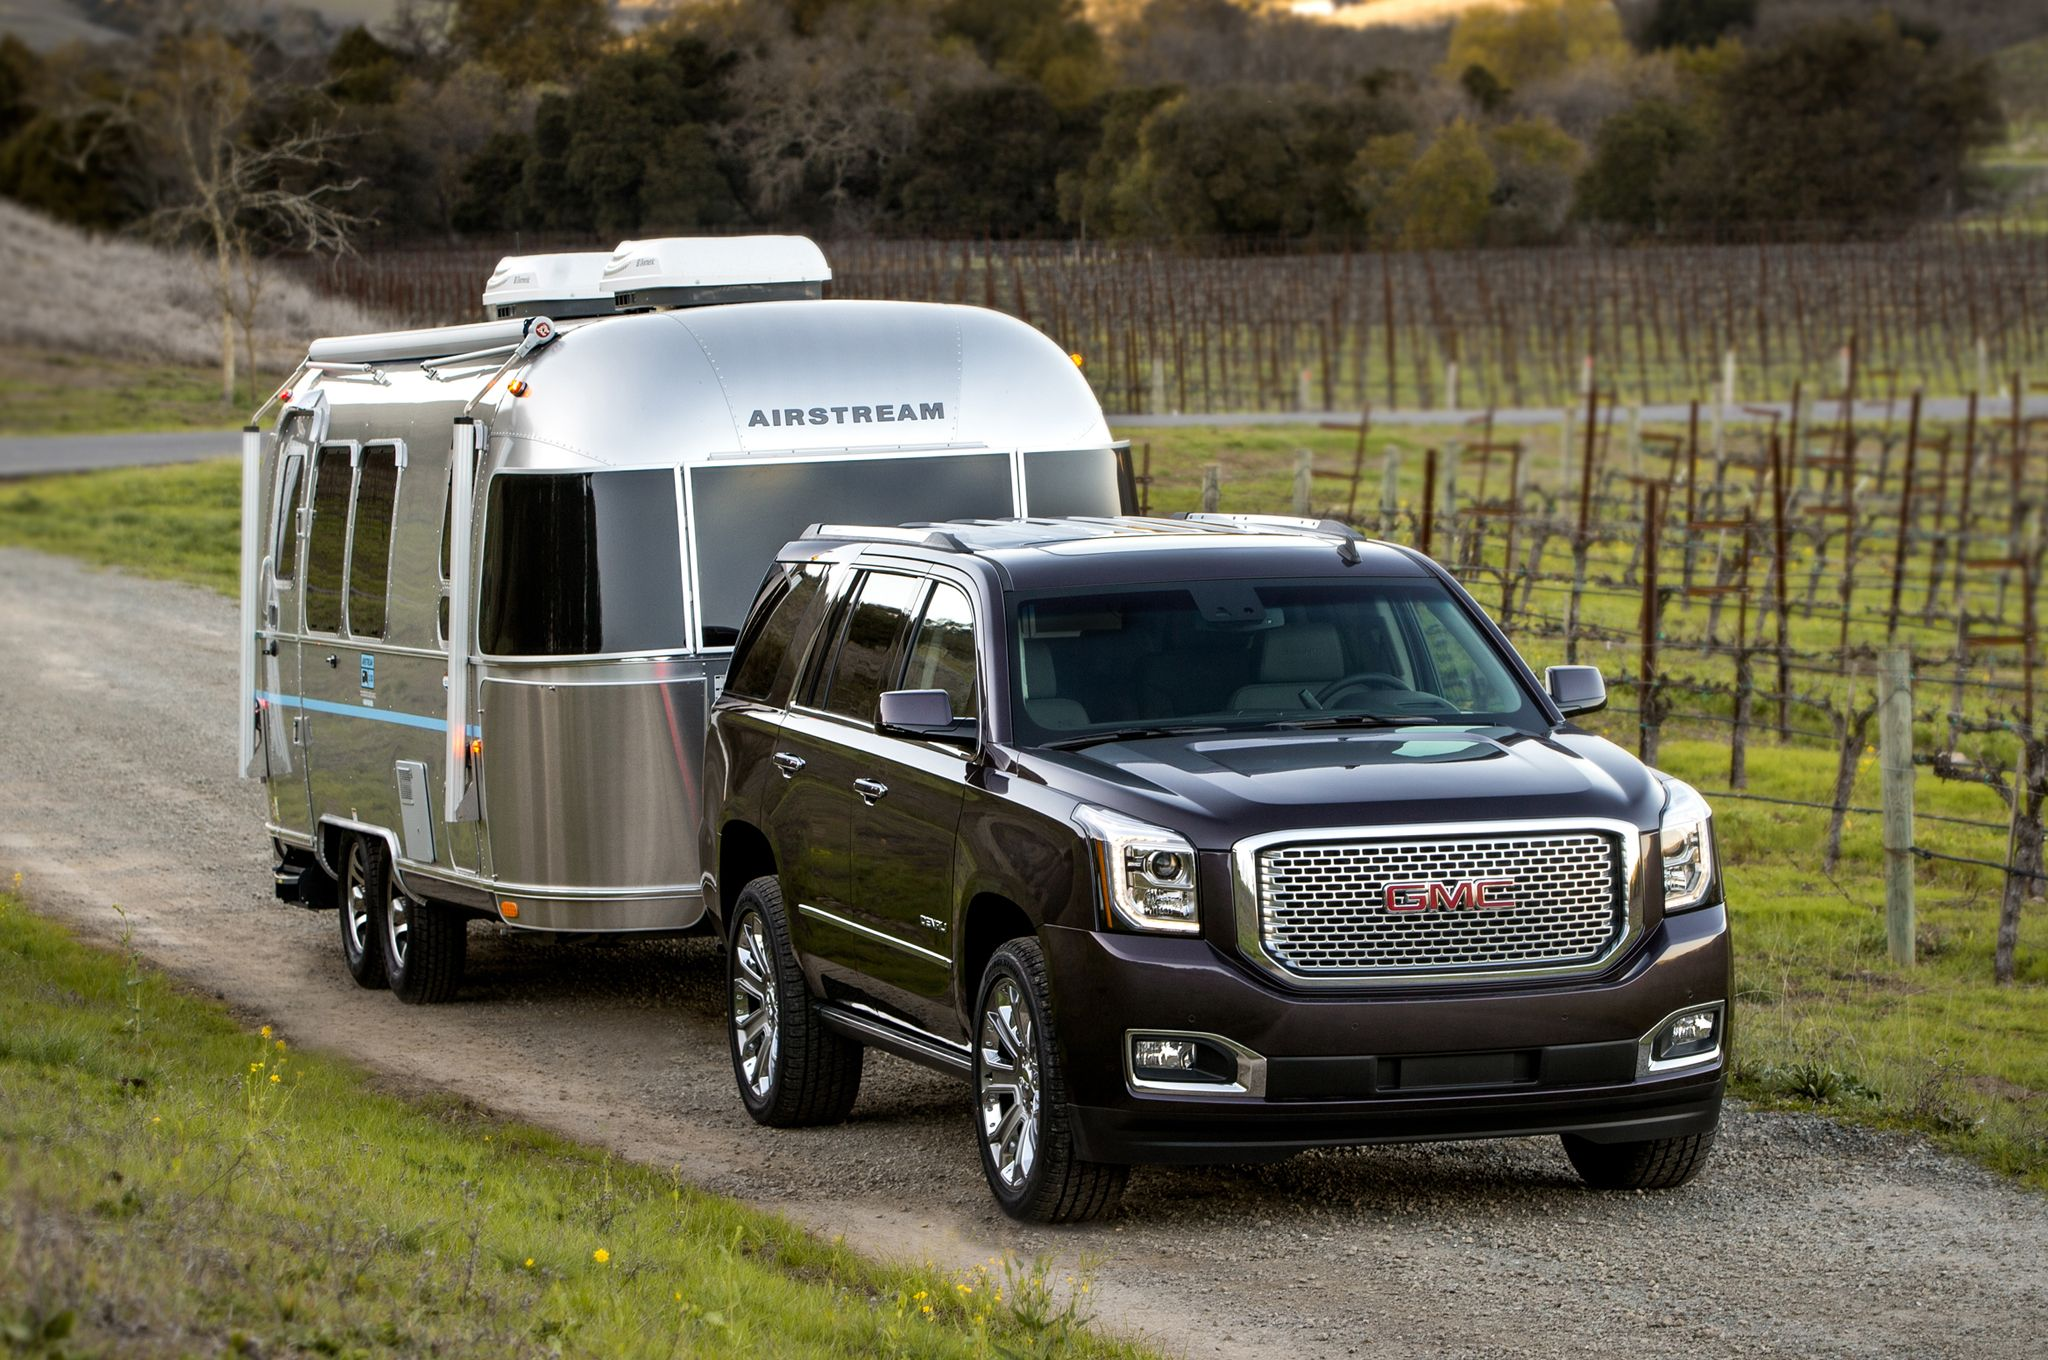 2015 Chevrolet Tahoe Suburban And Gmc Yukon Xl And Denali First